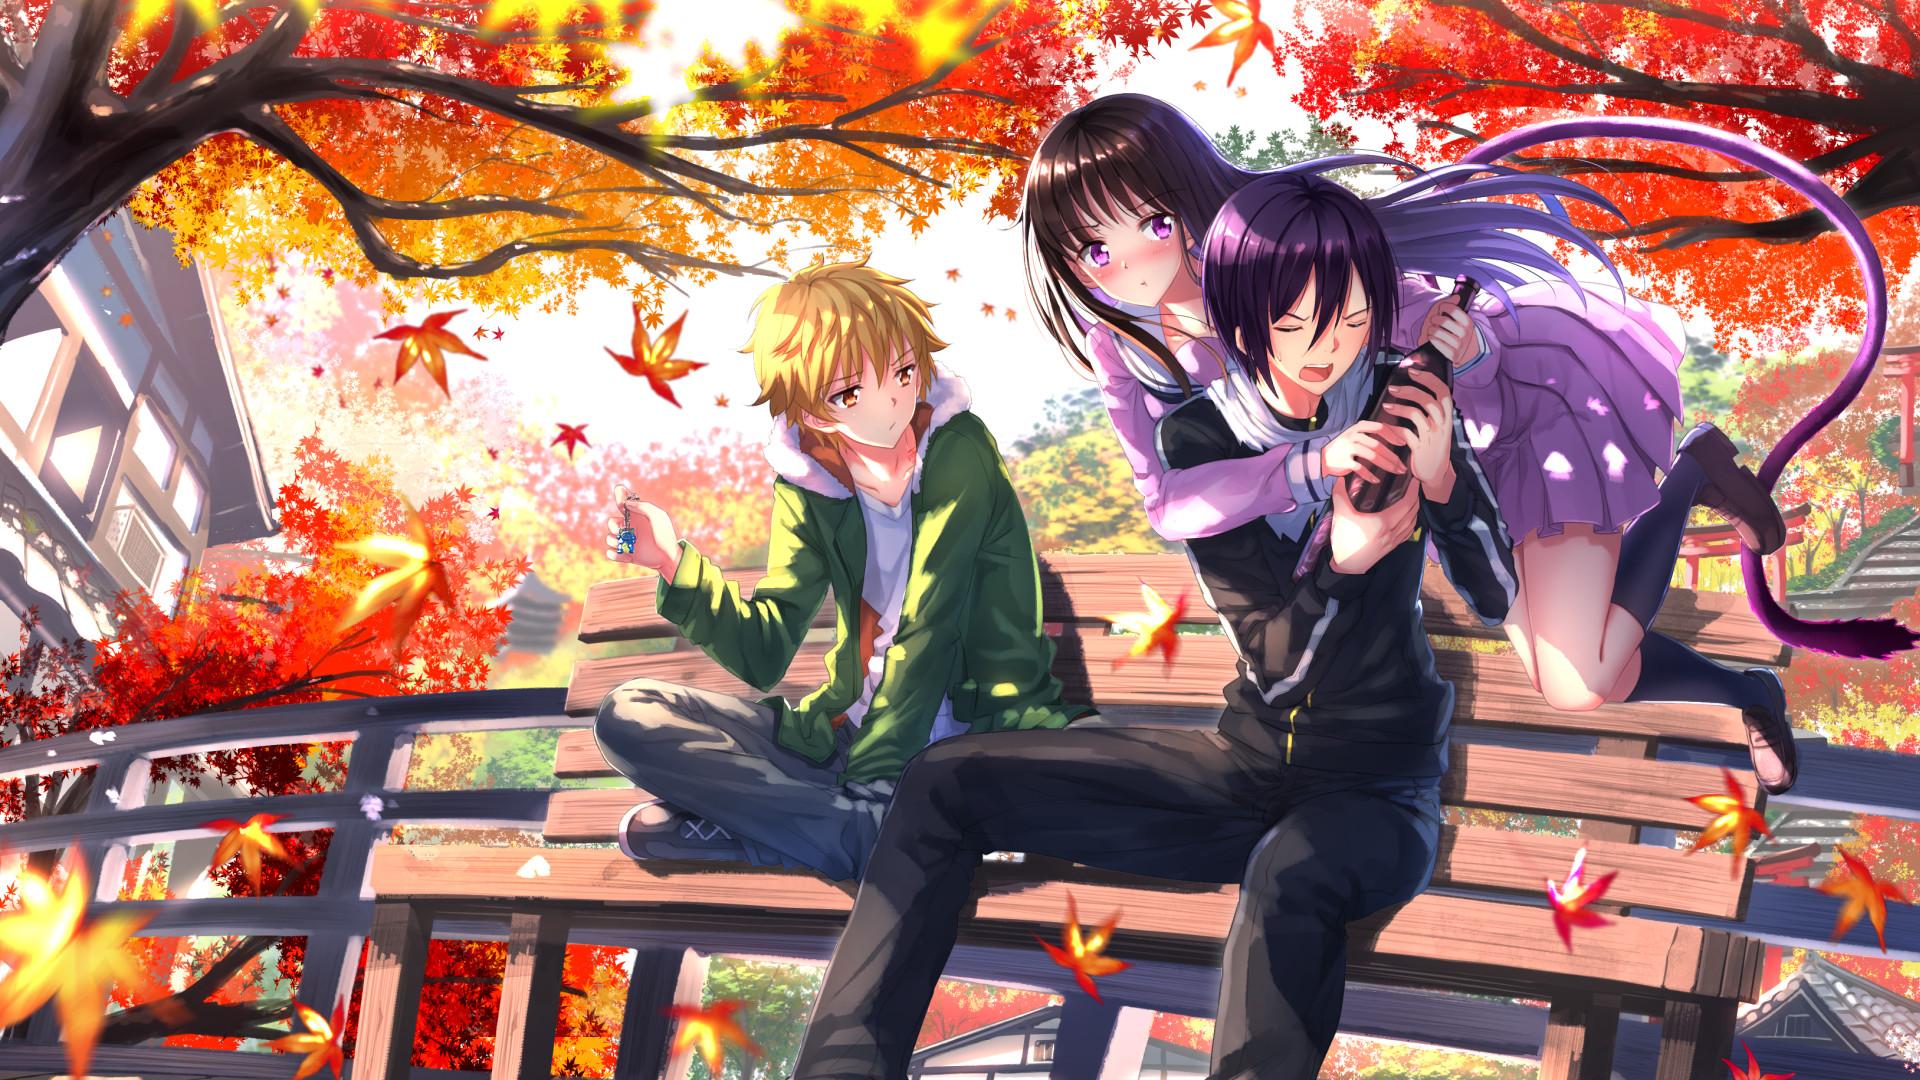 Anime – Noragami Yukine (Noragami) Hiyori Iki Yato (Noragami) Wallpaper